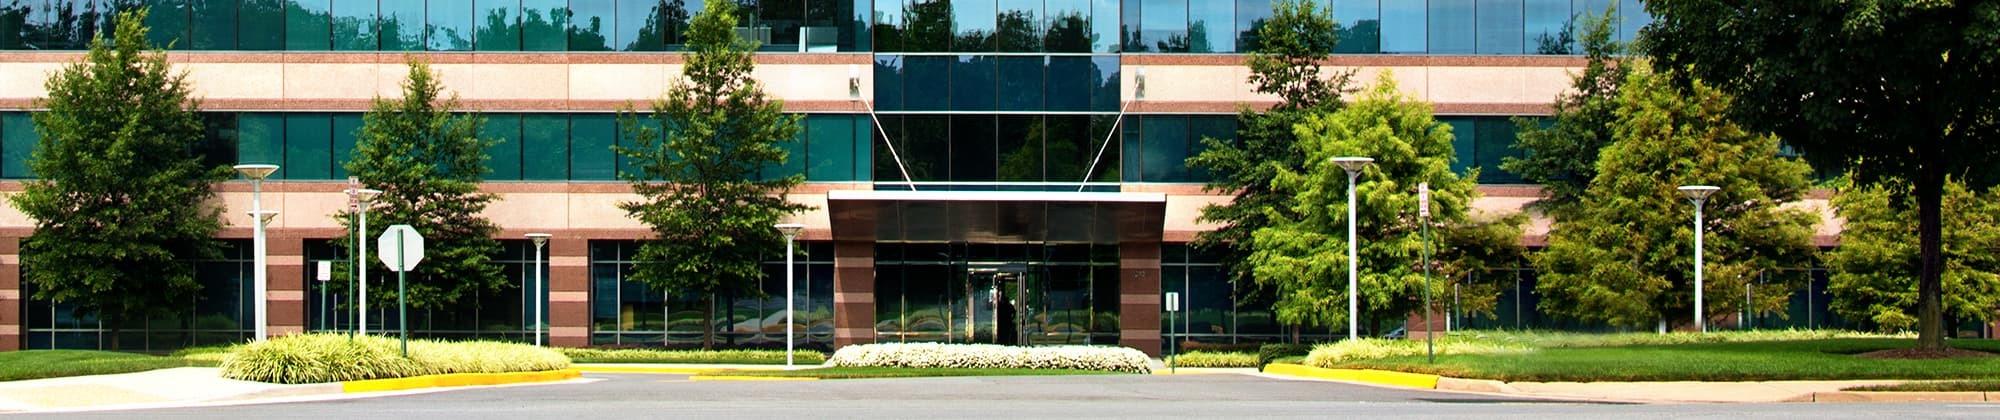 Personal Financial Management Advisors Dallas - Ross & Blumenthal